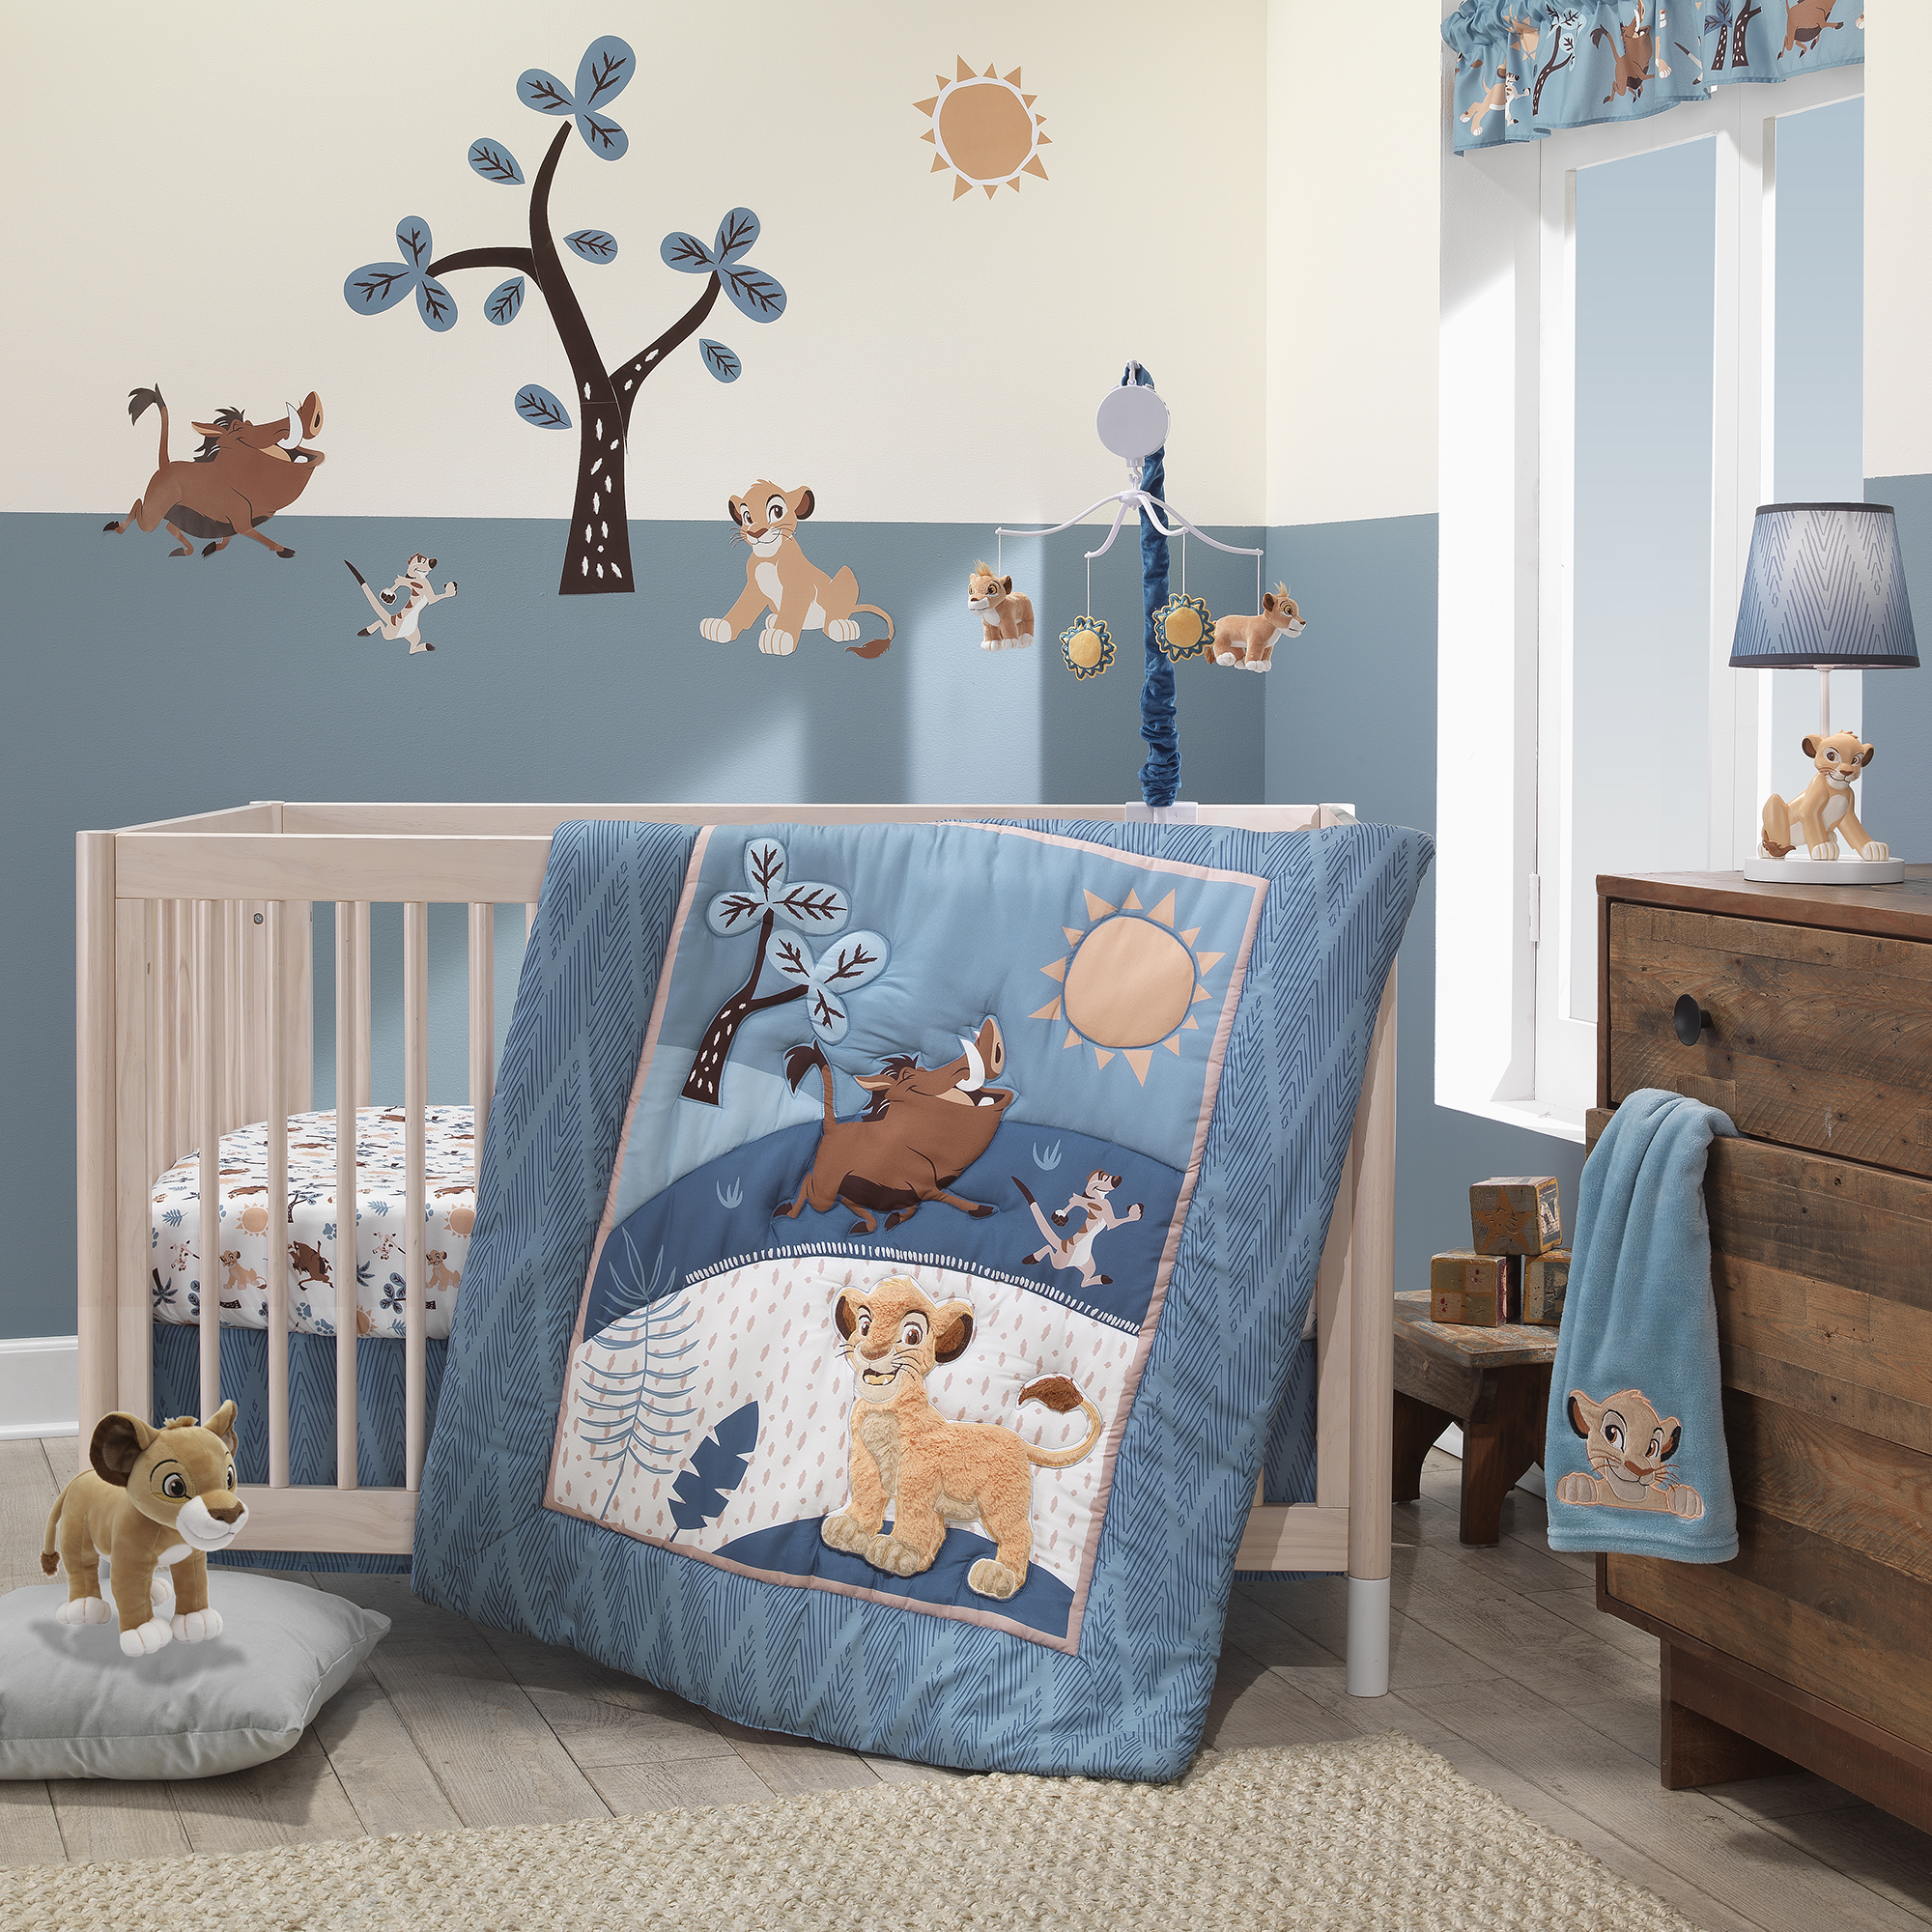 Lion King Adventure 4-Piece Crib Bumper